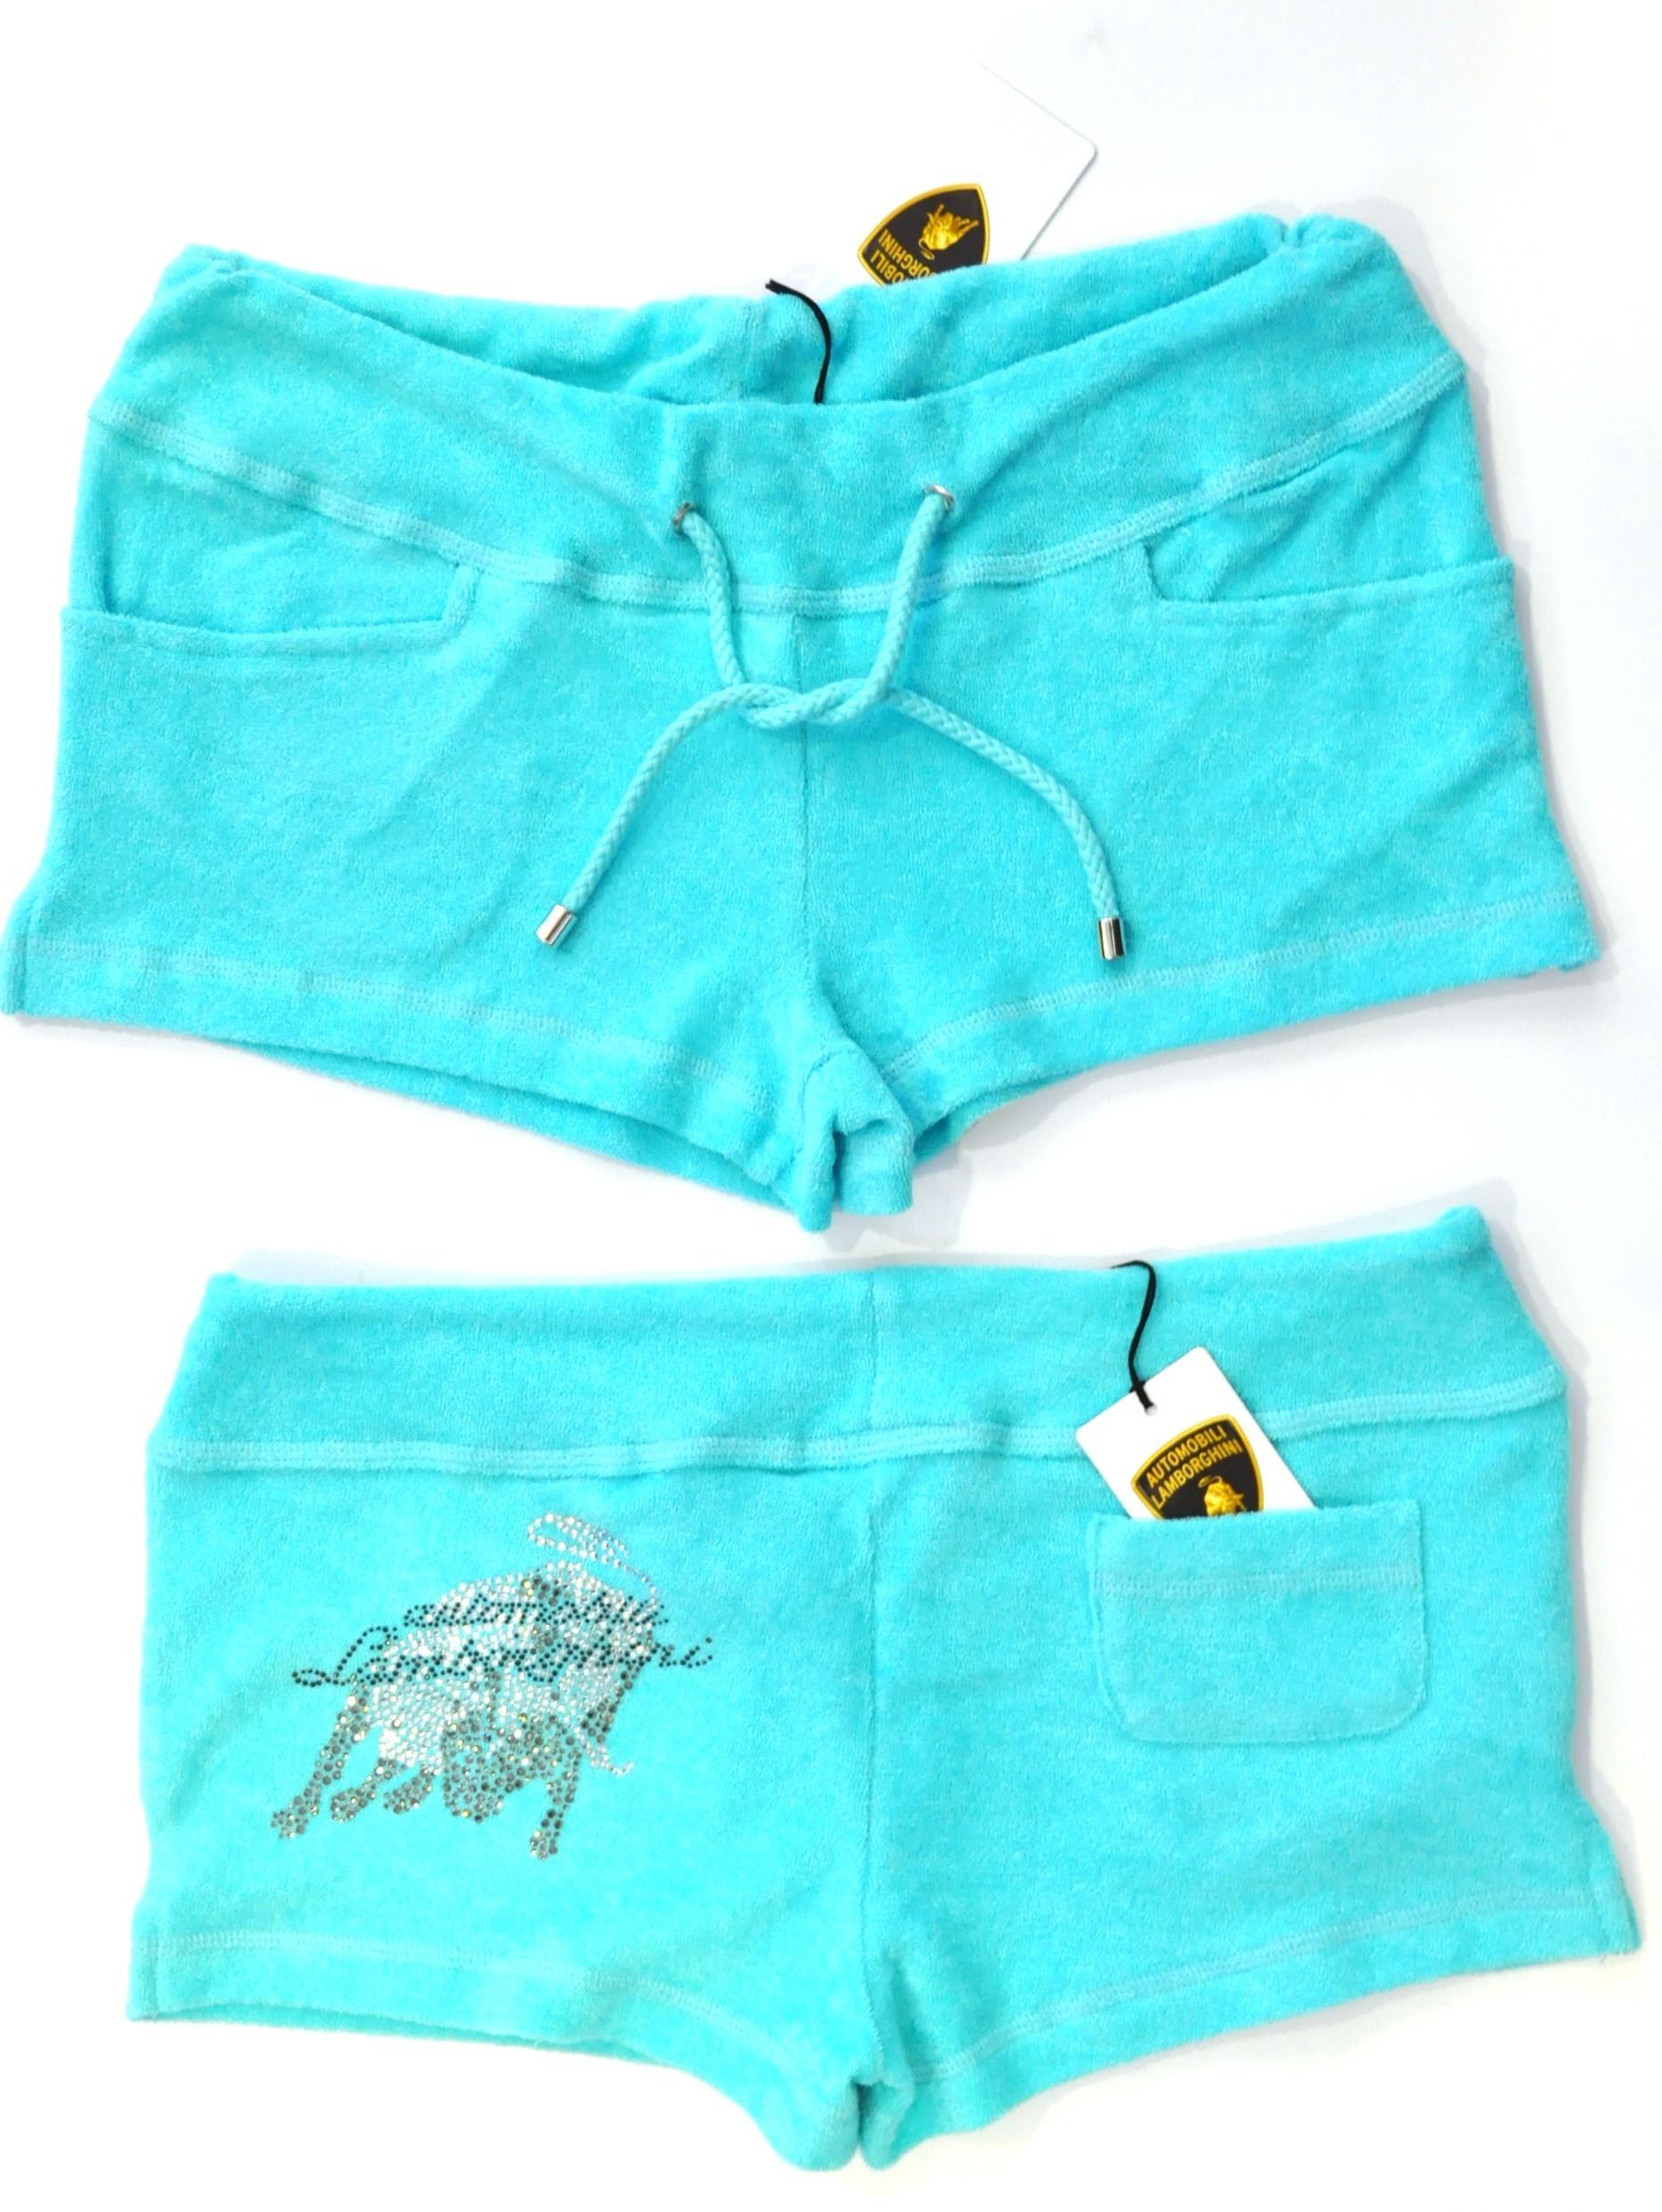 Lamborghini Ladies Terrycloth Hot Pants  Aqua